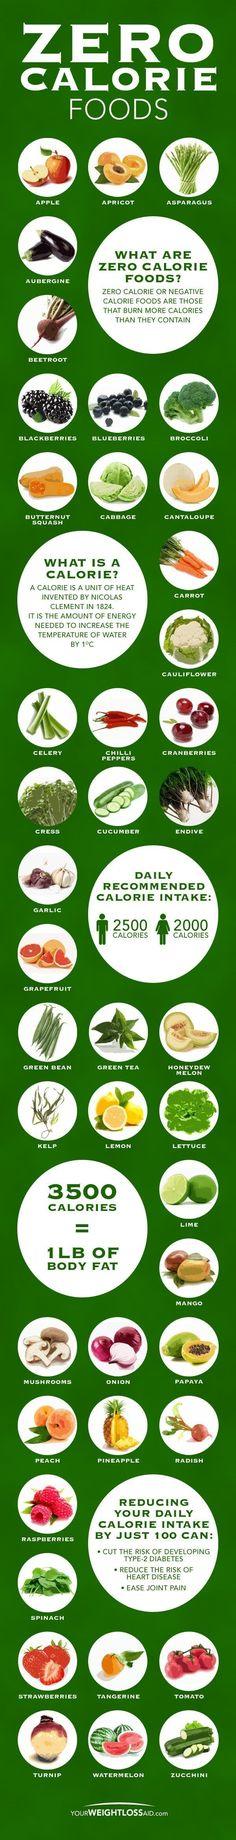 Zero Calorie Foods by JLB2012